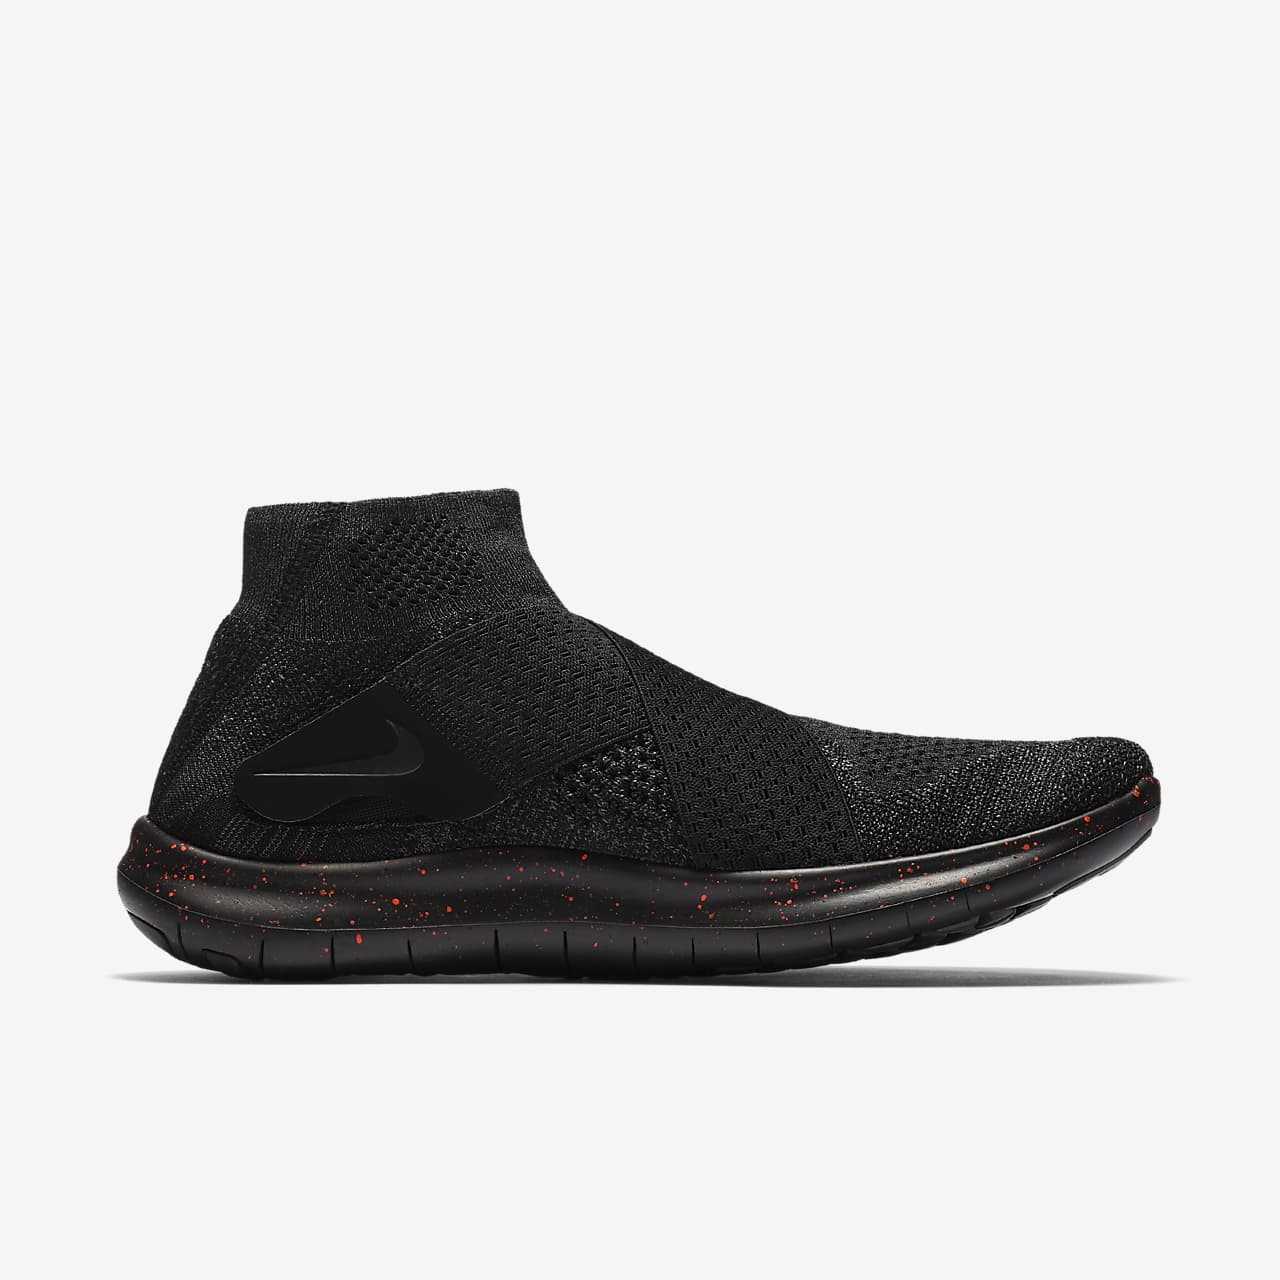 Download Nike Men's Free Rn Flyknit 3.0 Running Shoes JPG